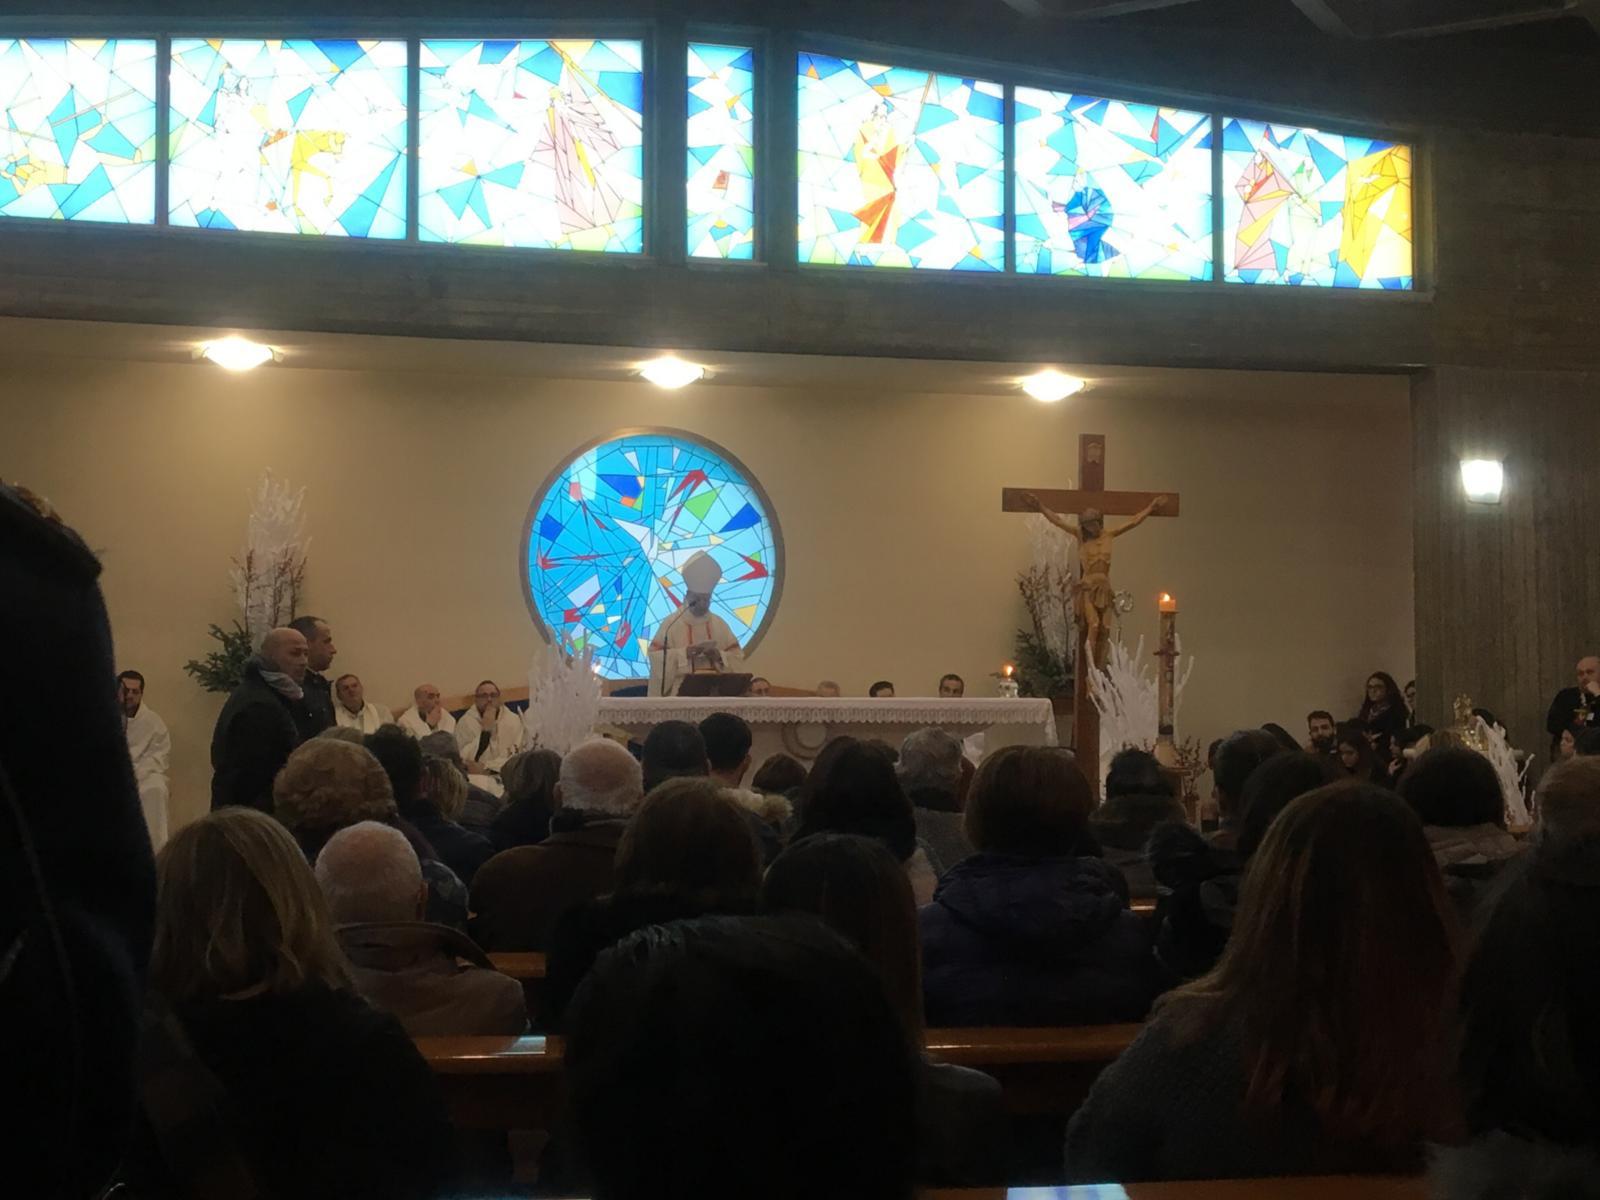 vescovo funerali giuseppe